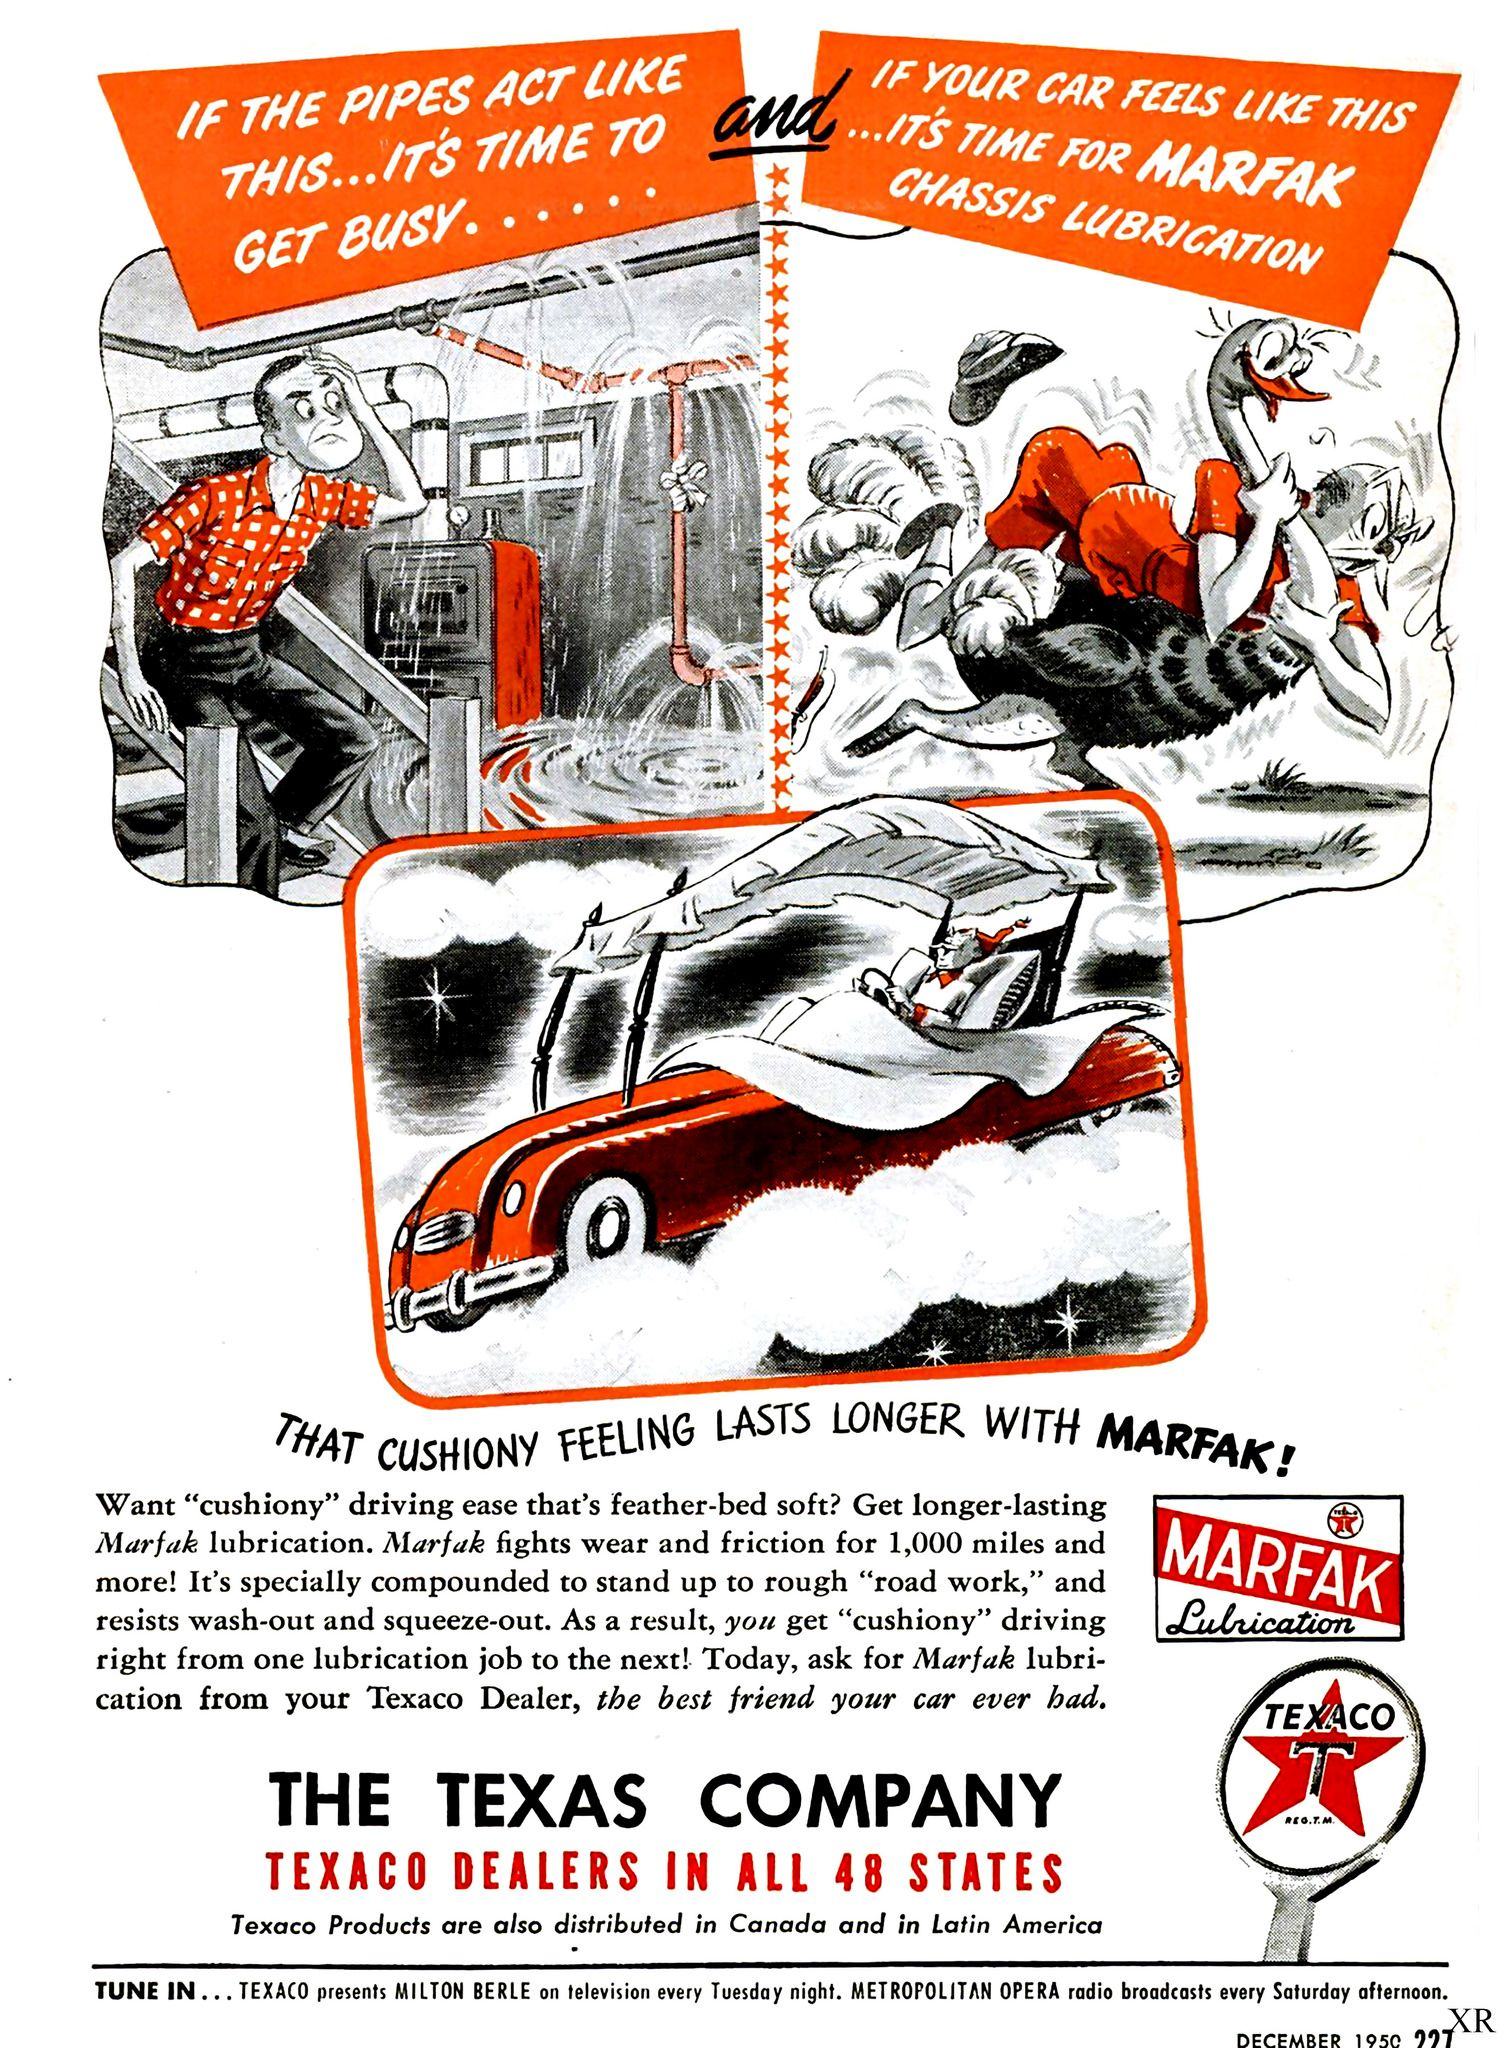 1950 Marfark First Photo Car Advertising 70s Cars